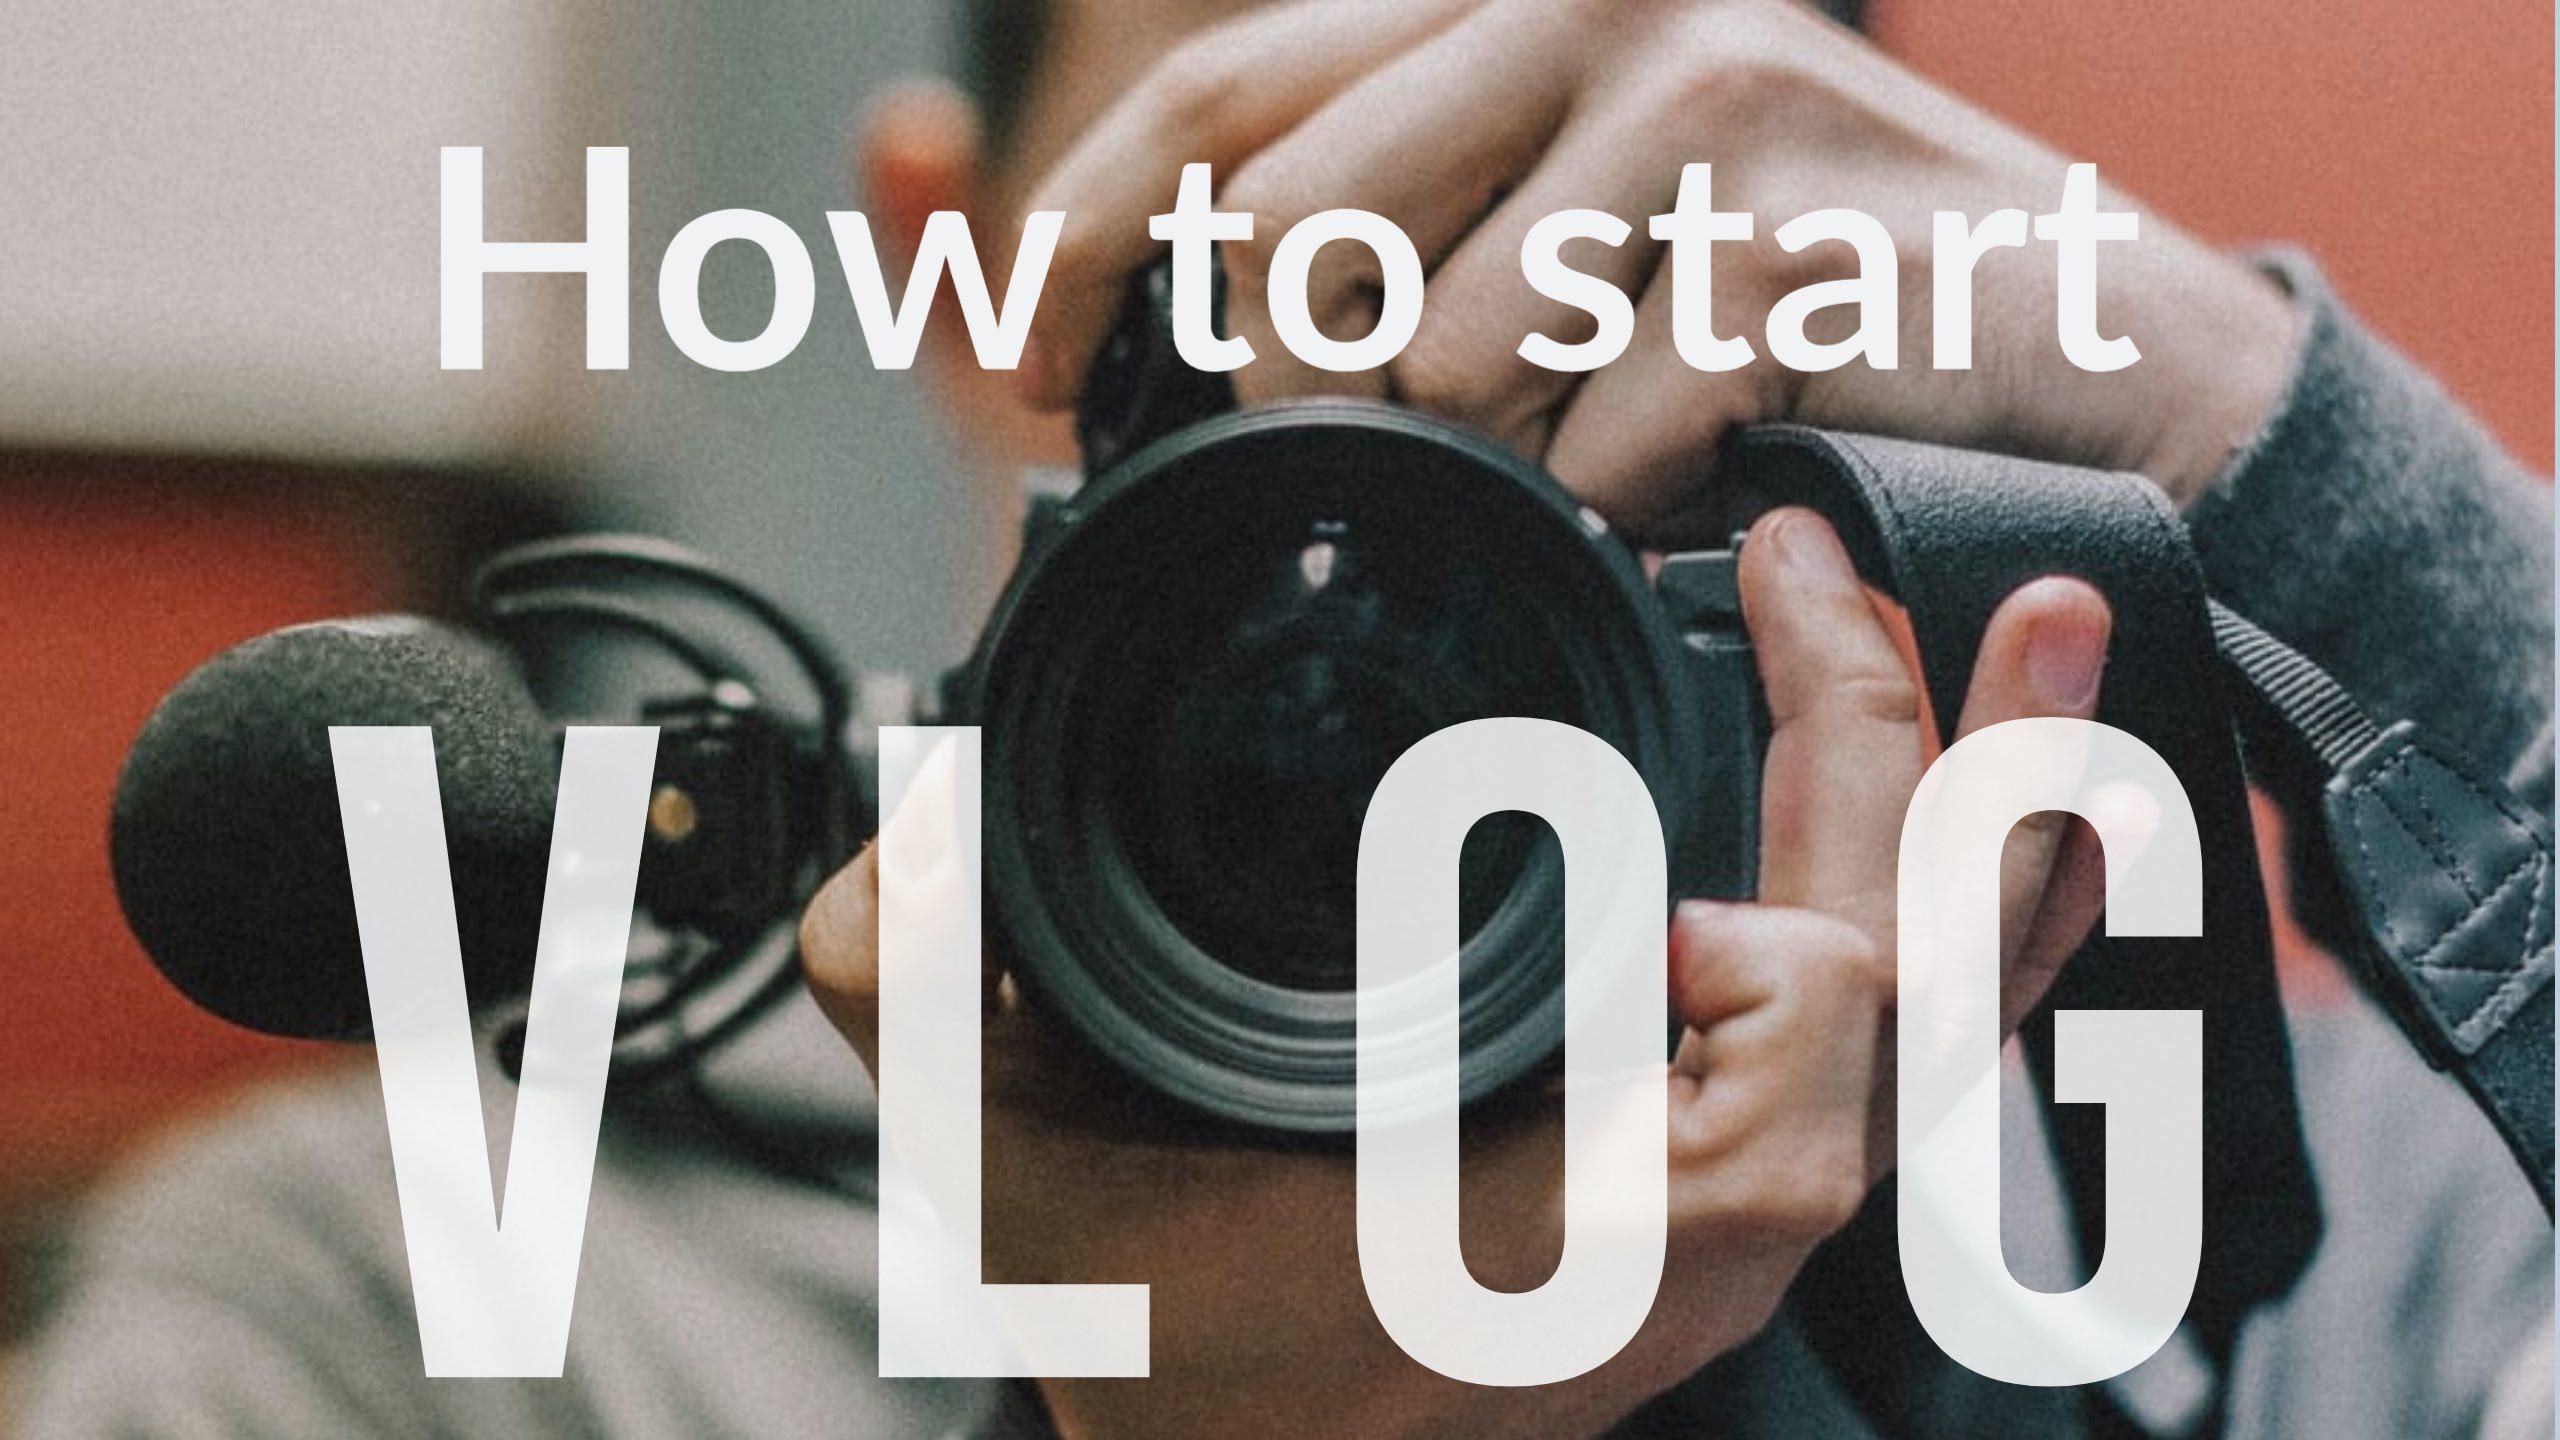 【Vlogの始め方】必要な機材から作り方の流れまで総まとめ!【初心者向け】